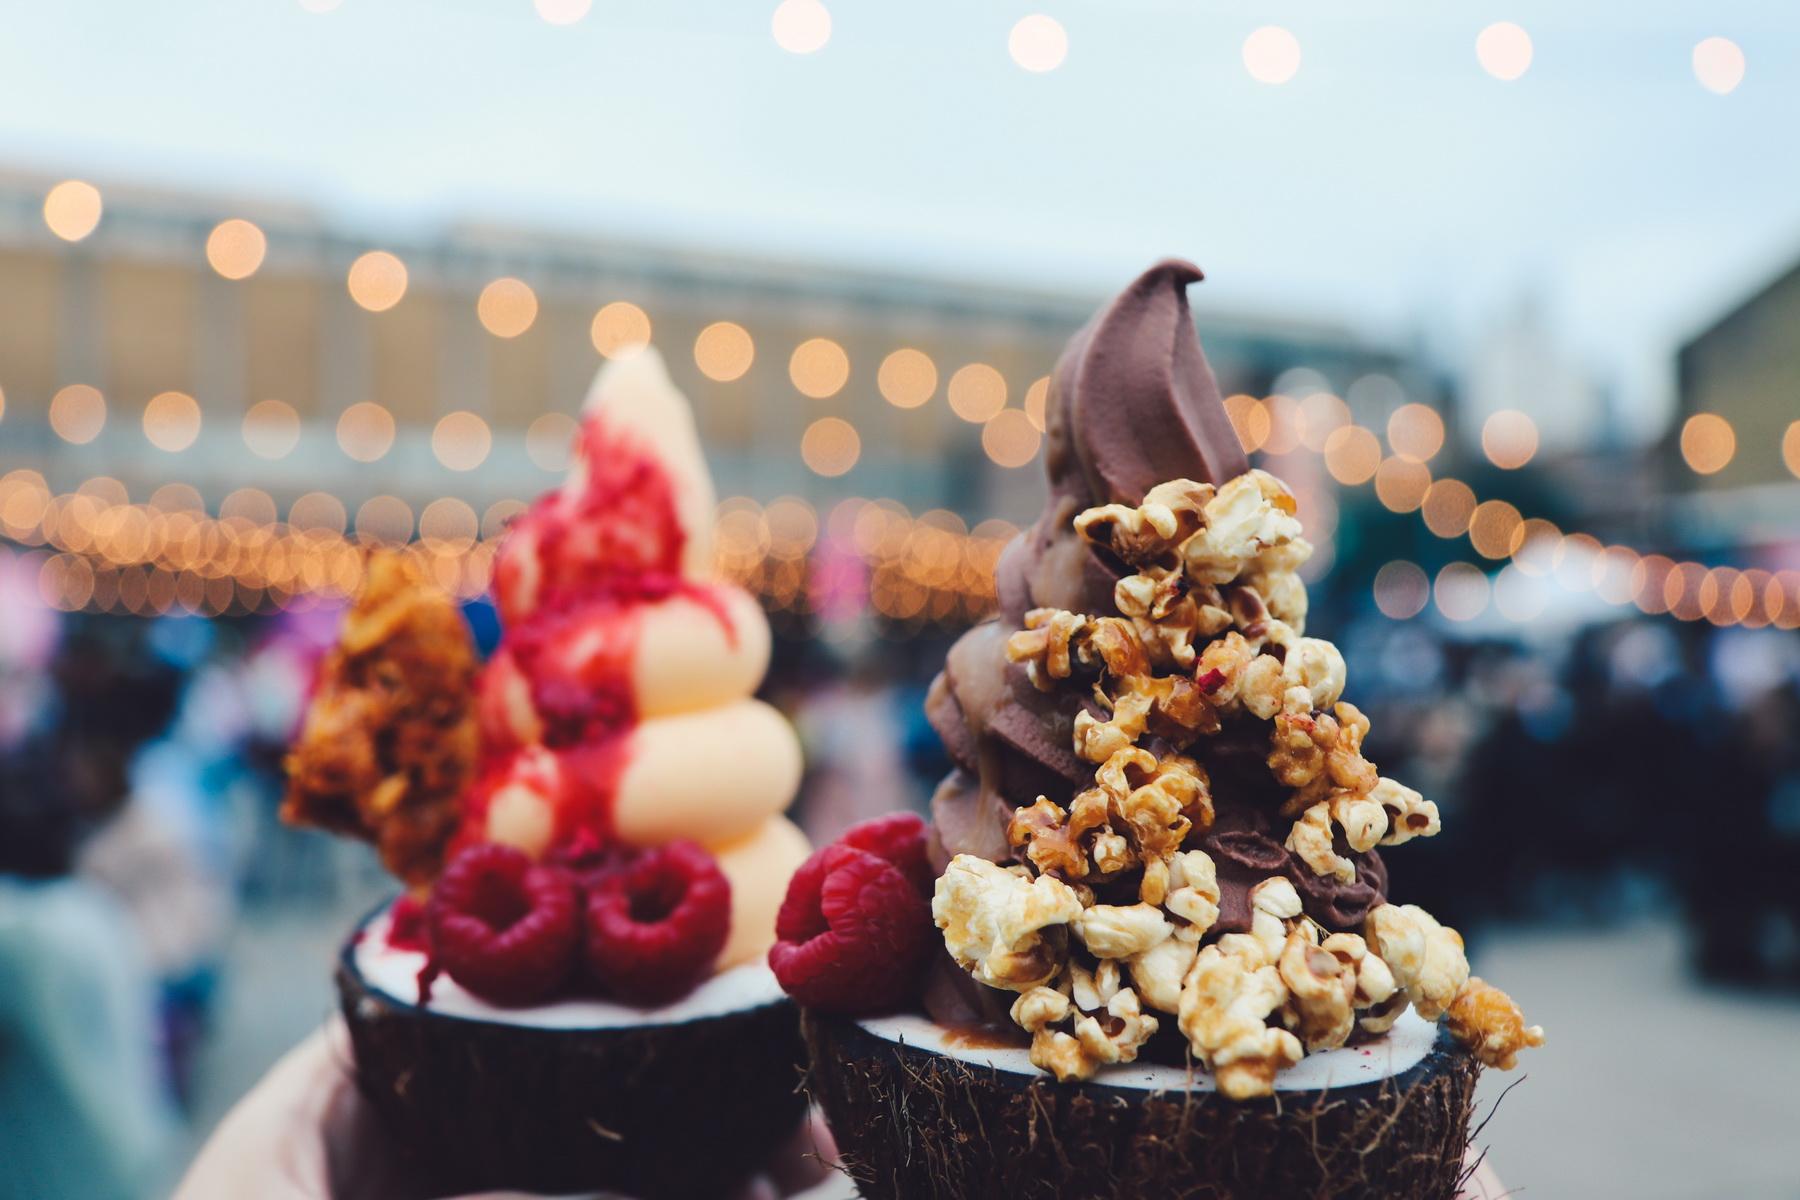 Plant-based ice cream at Vegan Nights